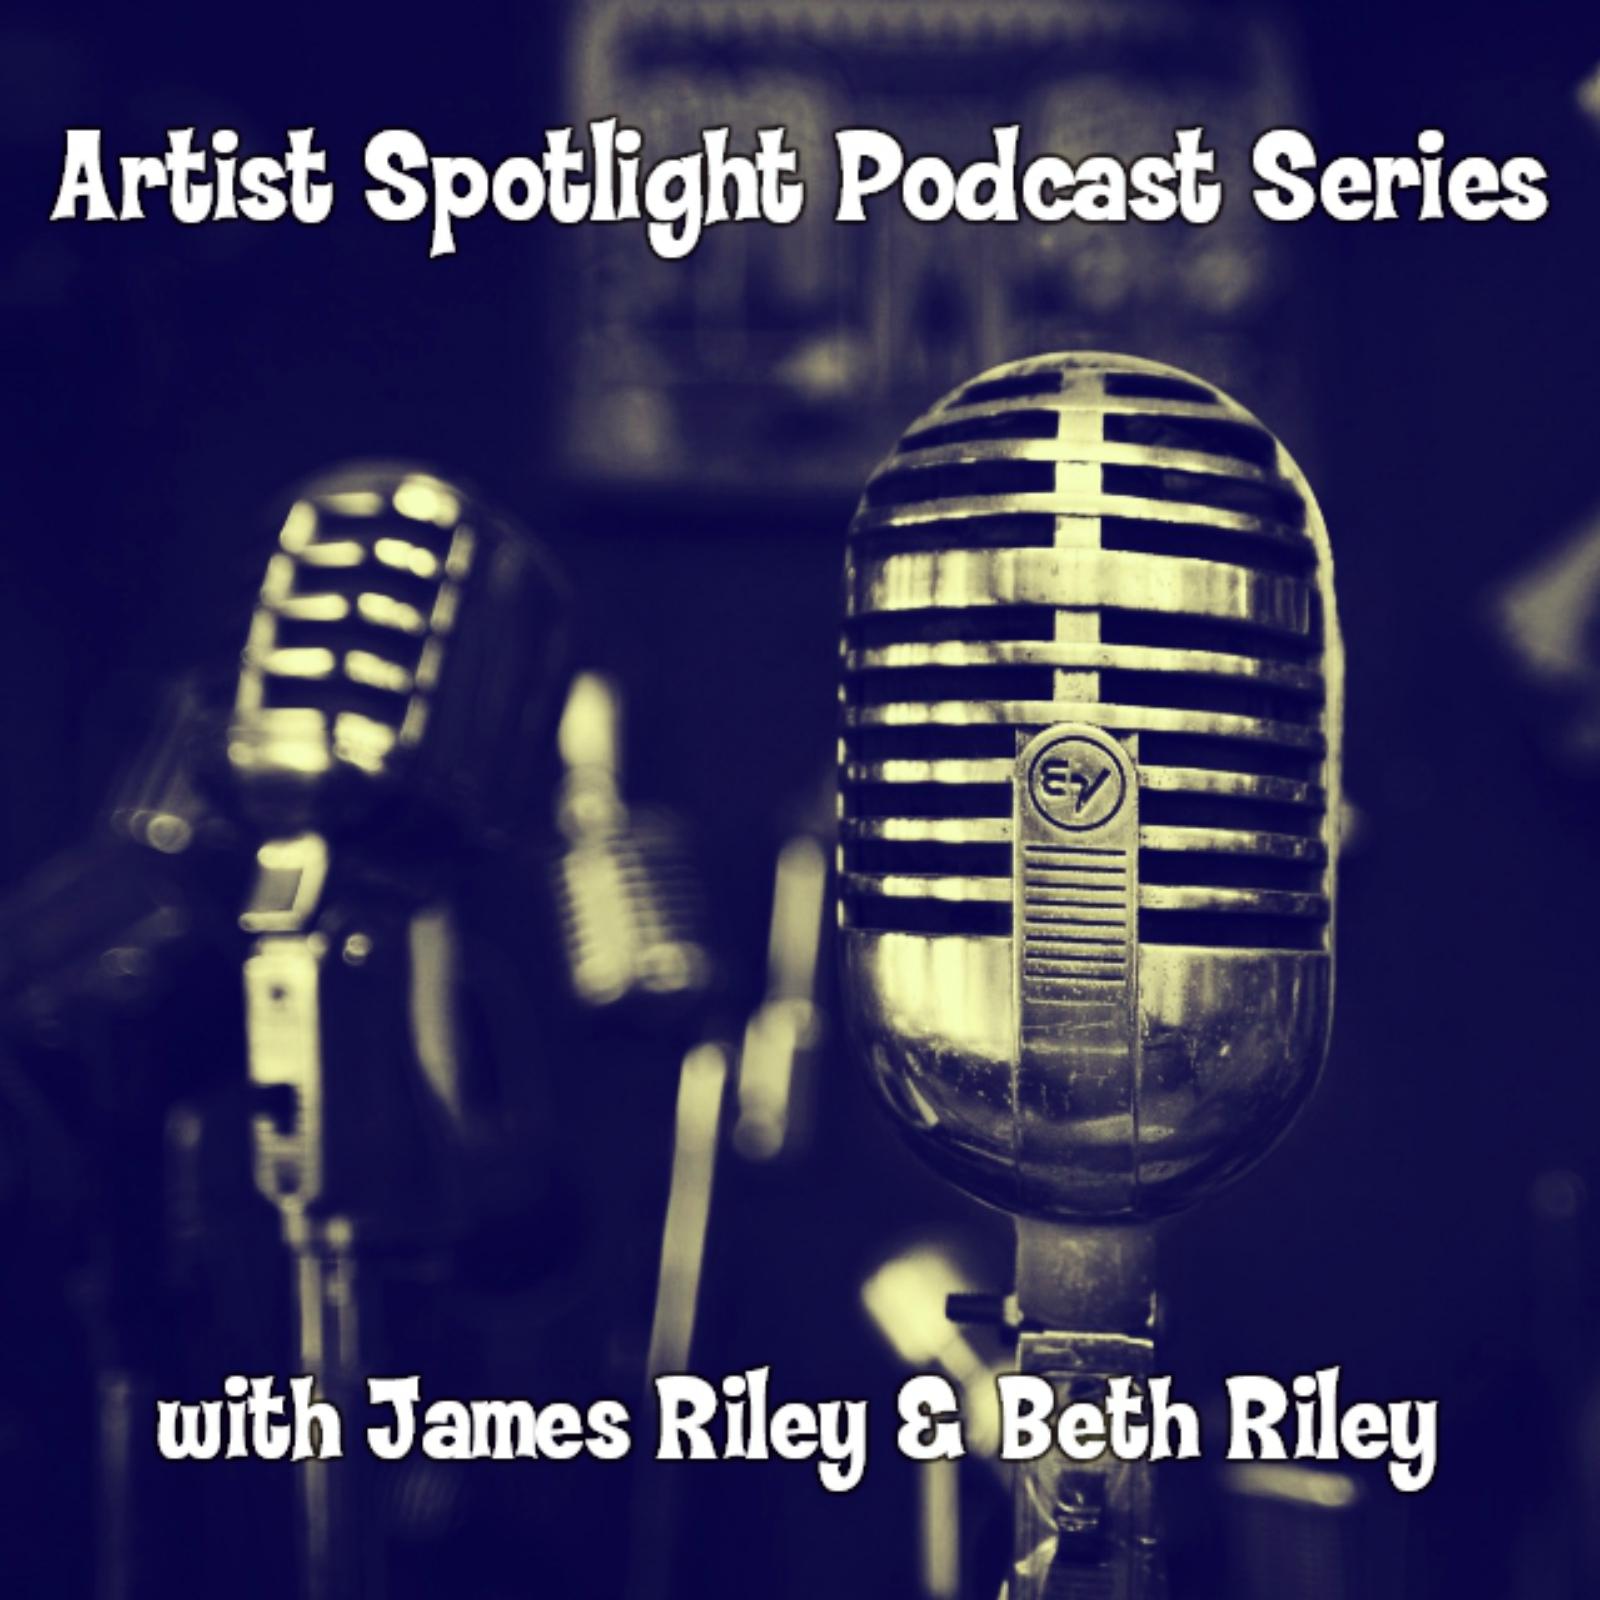 Artist Spotlight Podcast Series show art